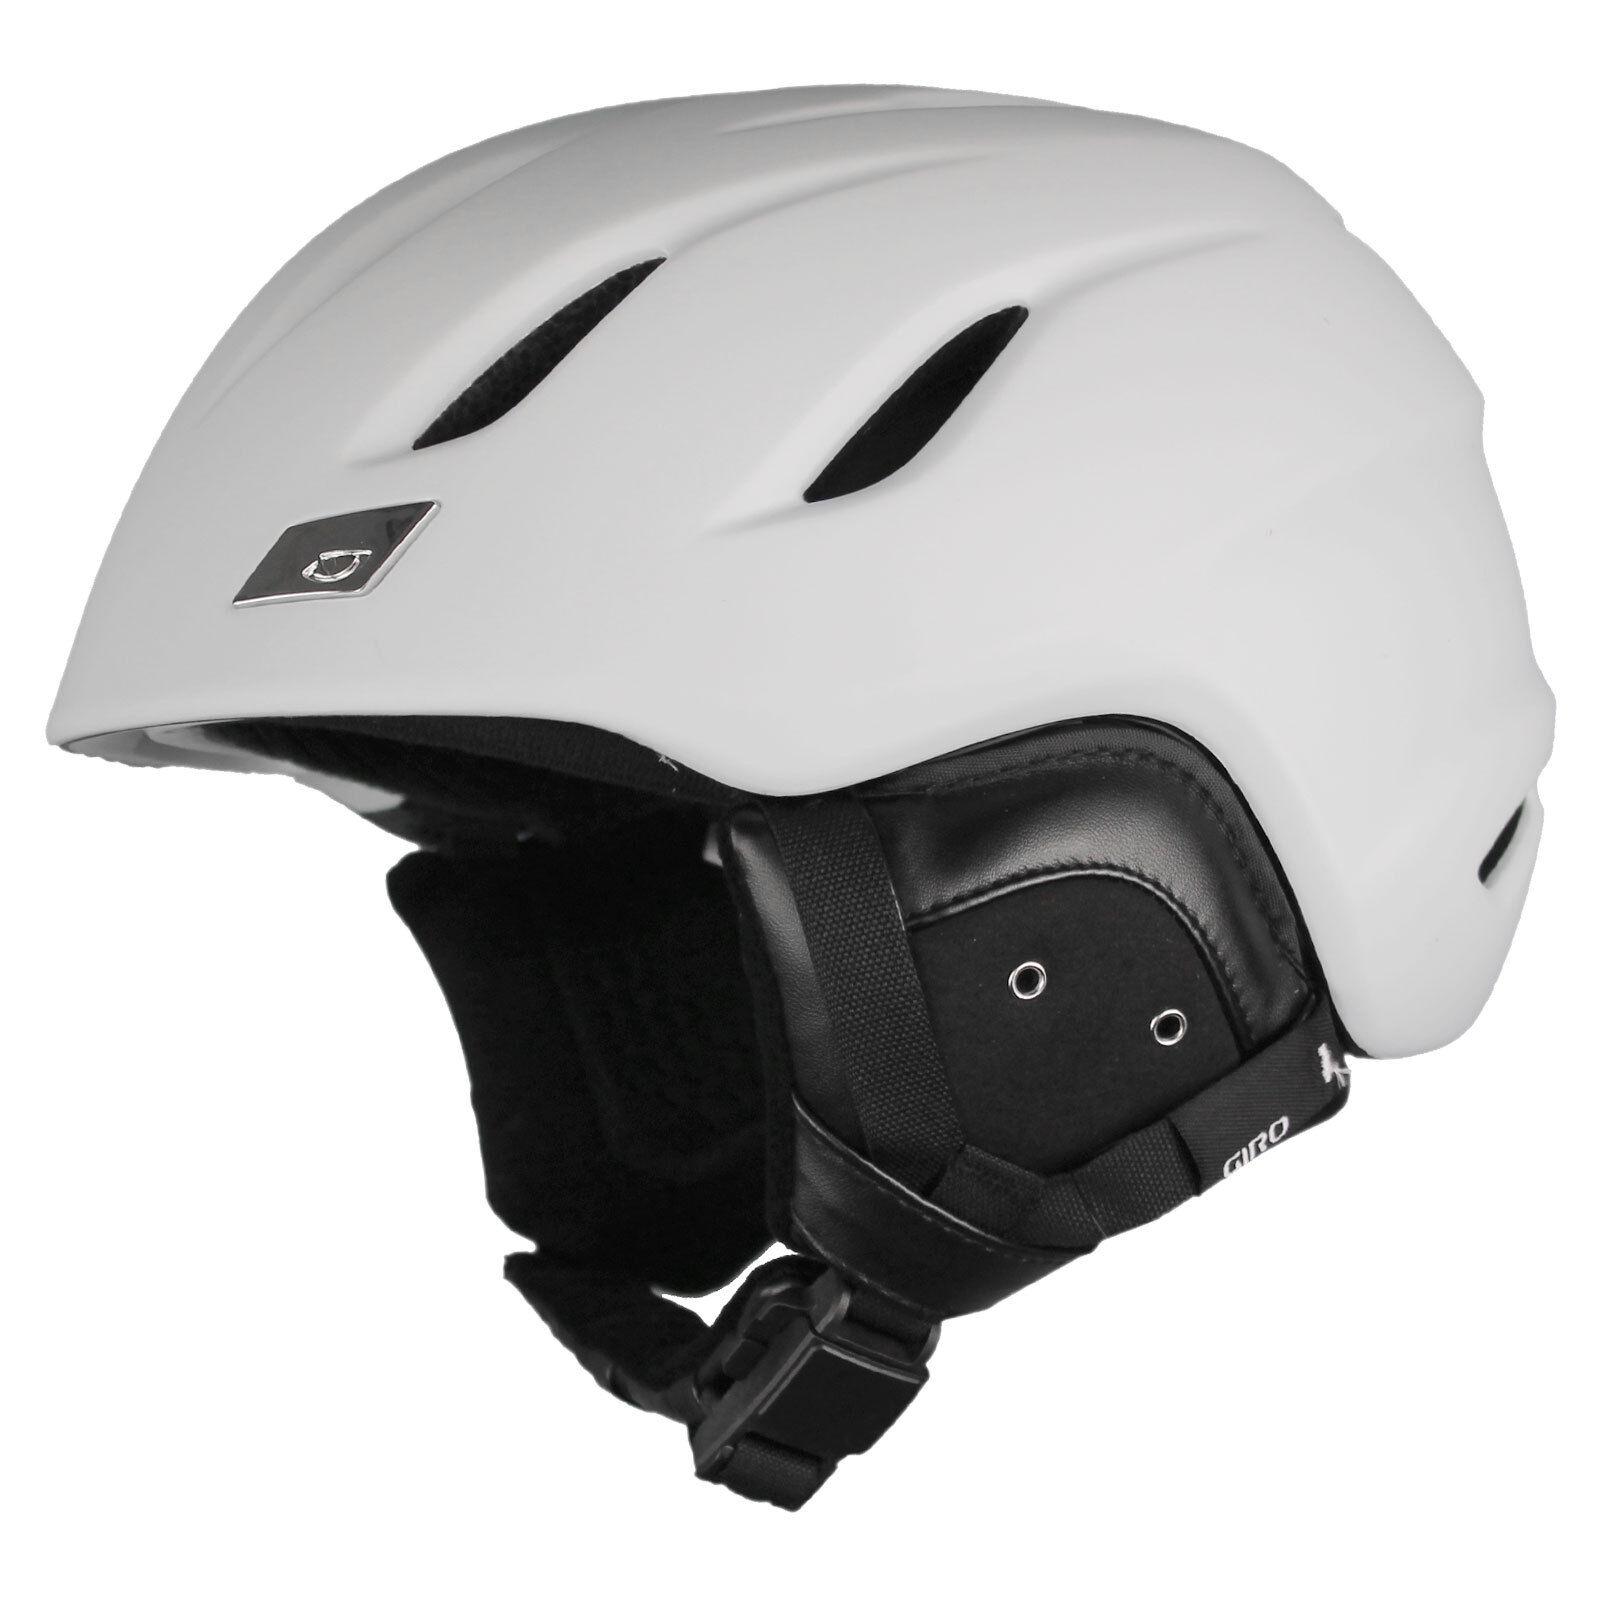 Giro Nine Schwarz Plus Herren Skihelm Snowboardhelm Helm  Schwarz Nine Weiß Grau Grün 926b02